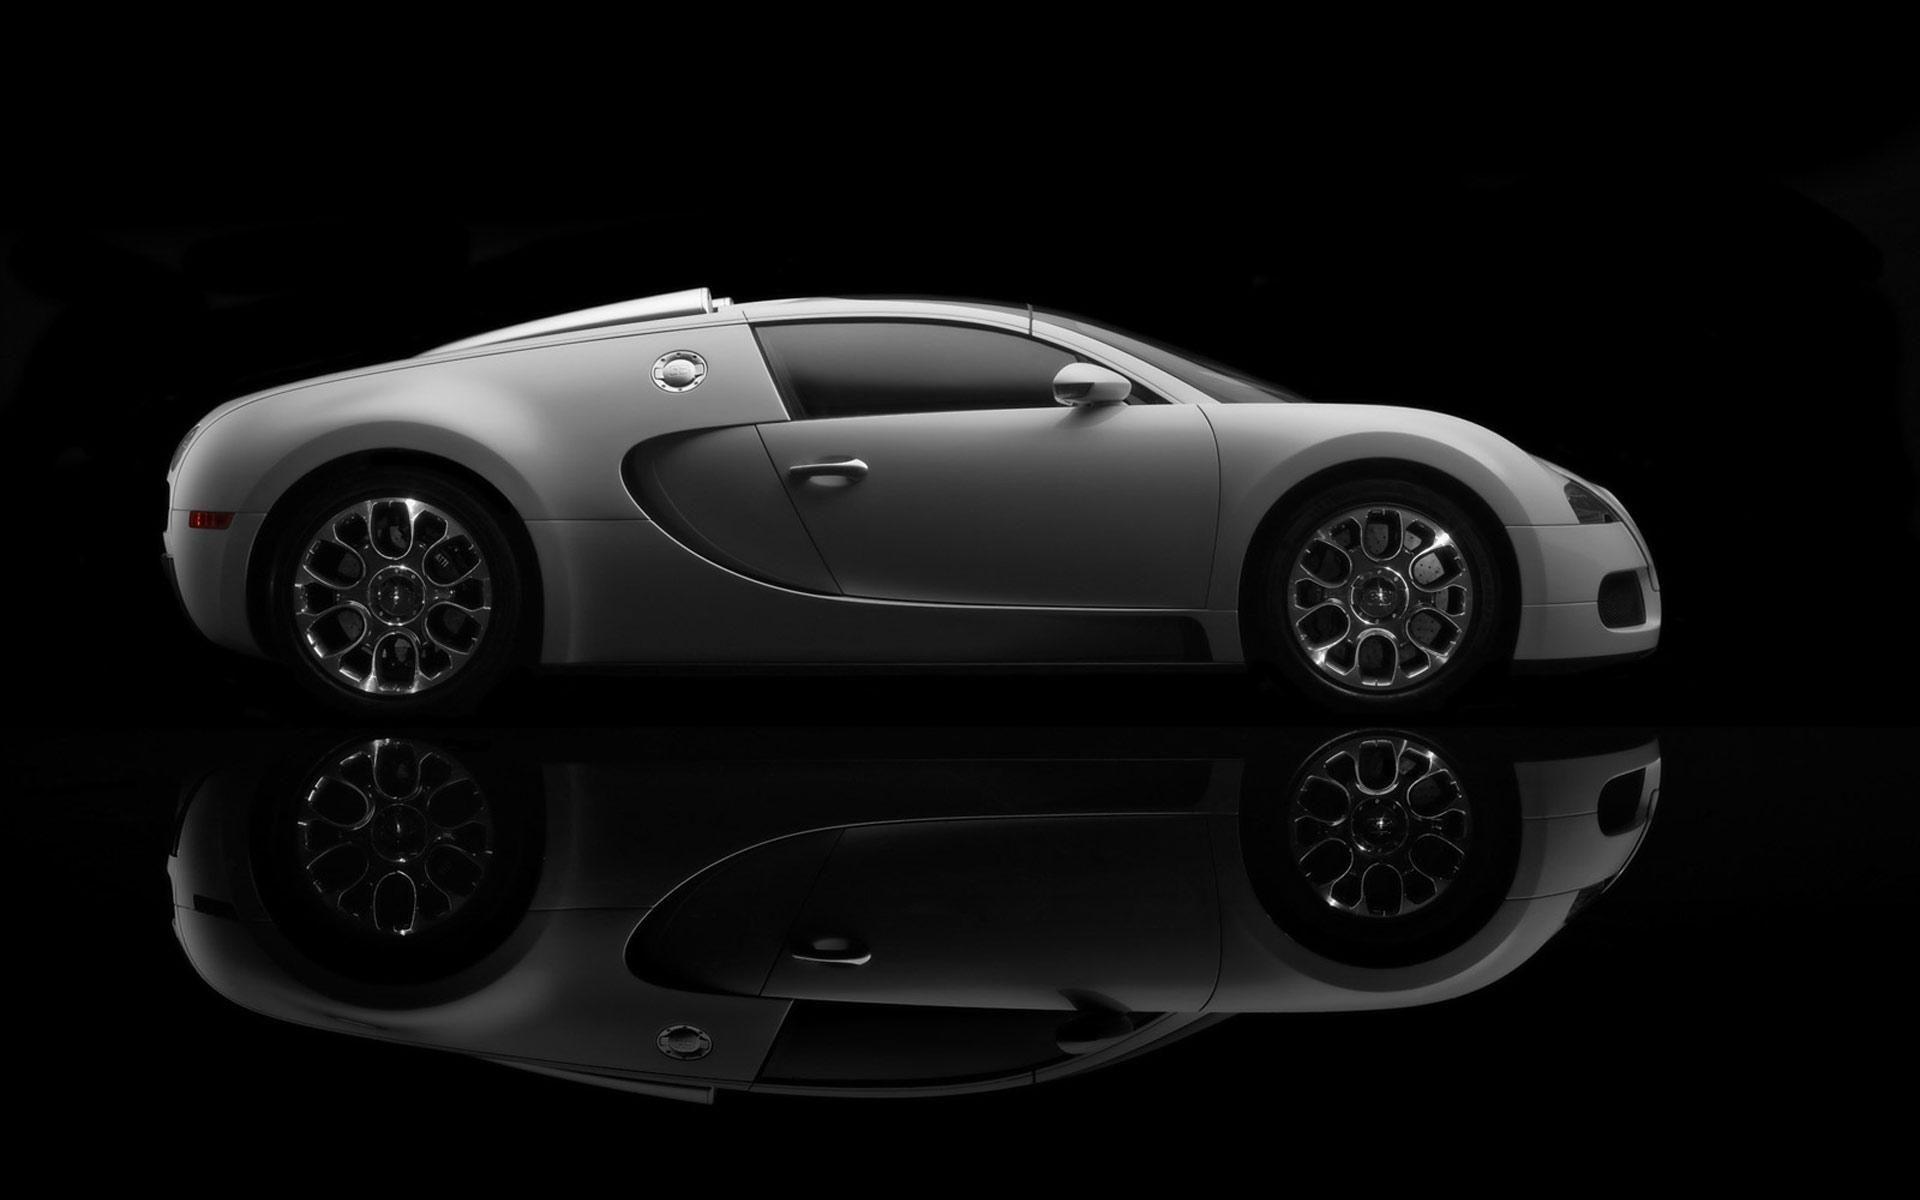 Bugatti Veyron Black Wallpaper Bugatti Wallpapers Bugatti Veyron Bugatti Veyron 16